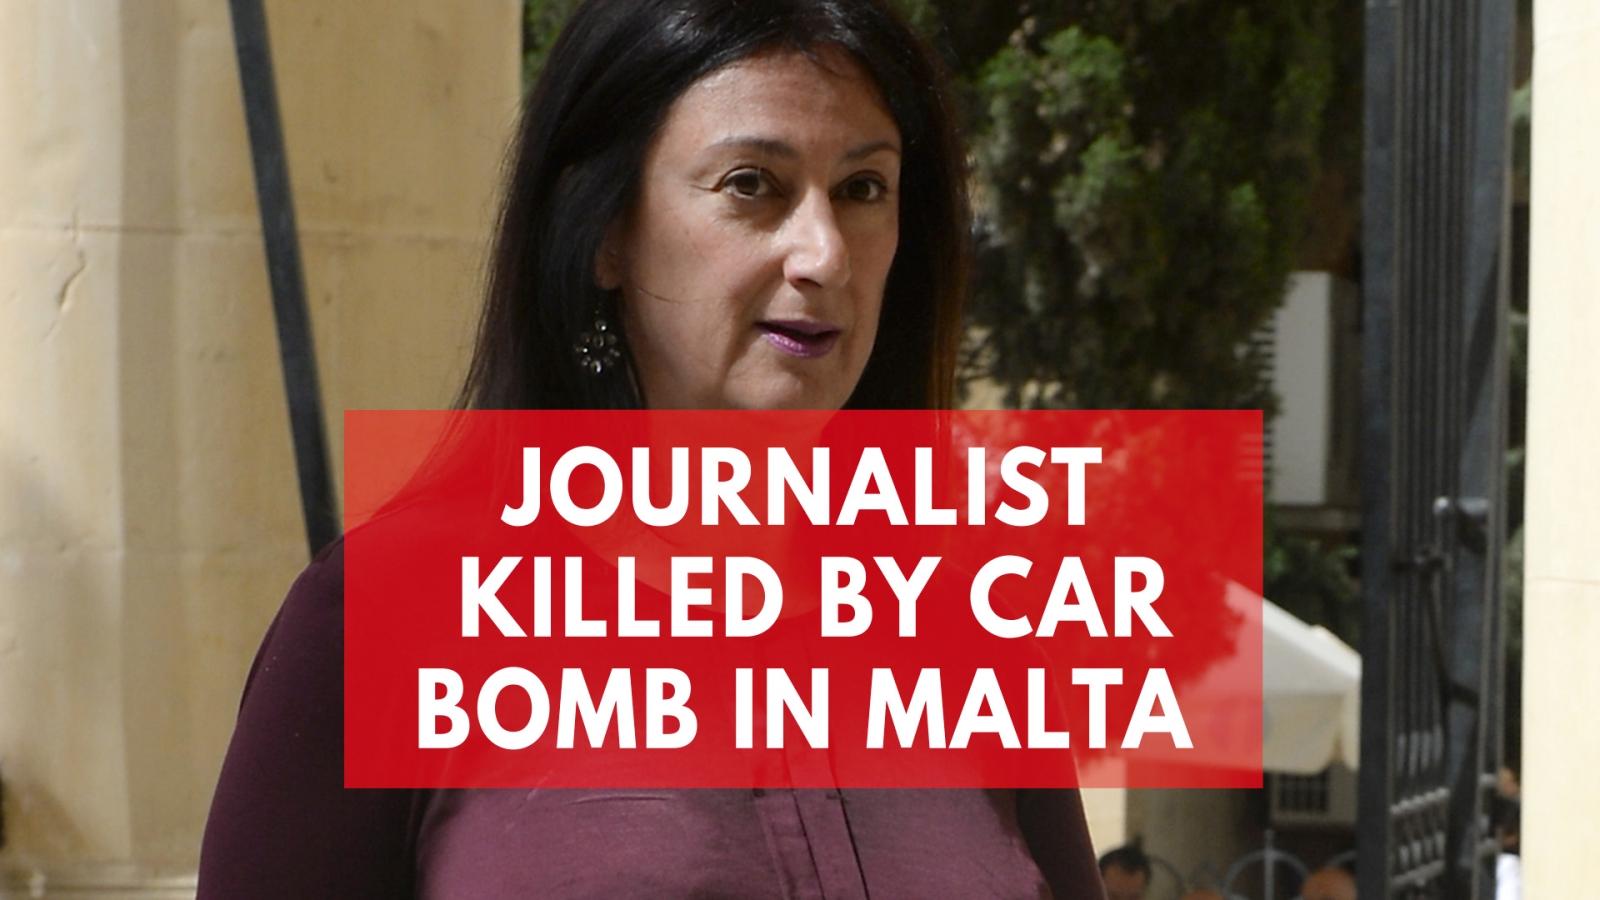 prominent-journalist-daphne-caruana-galizia-dies-in-car-bomb-attack-in-malta